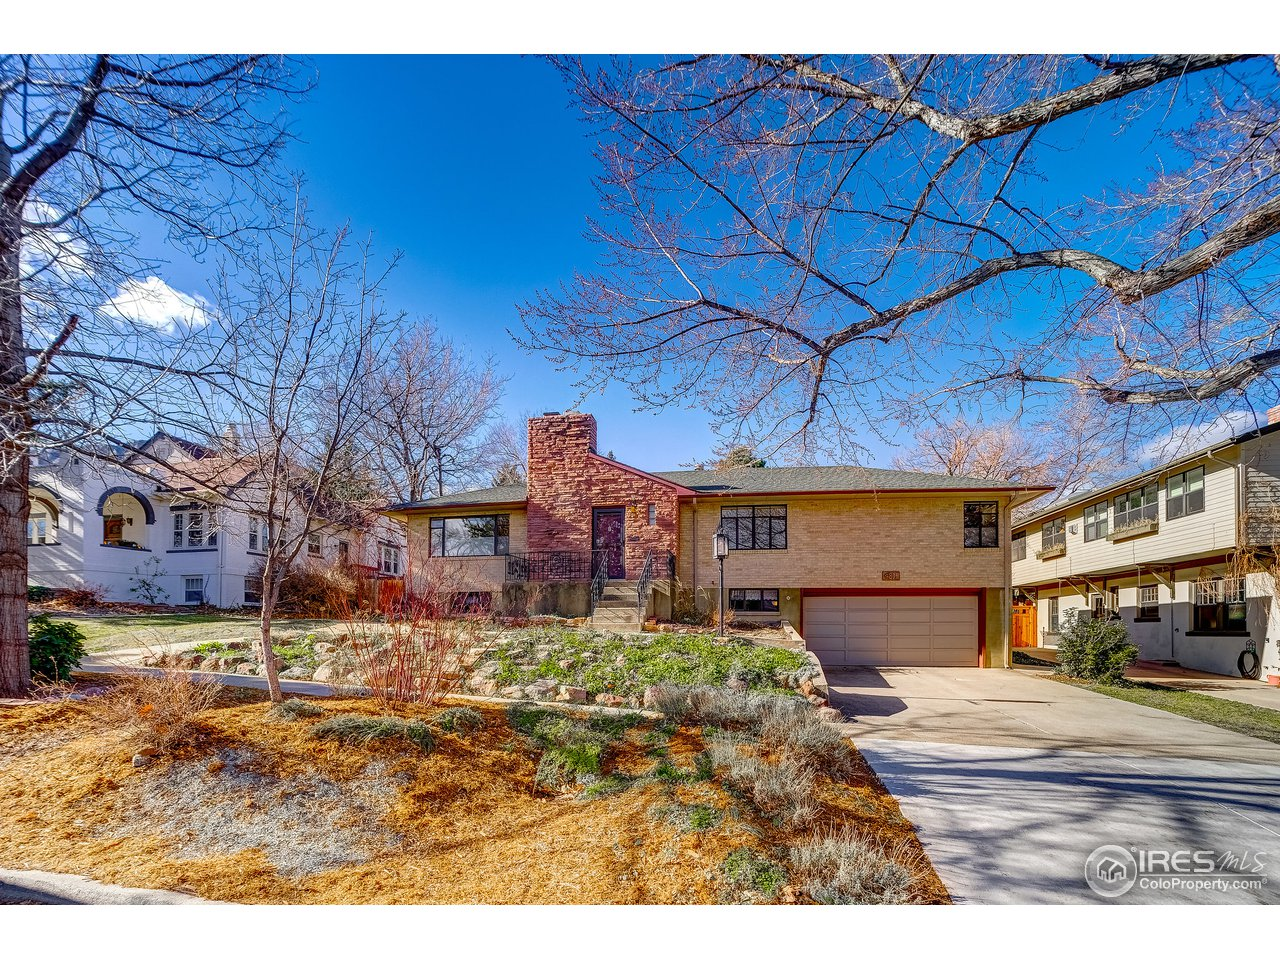 815 13th St, Boulder CO 80302